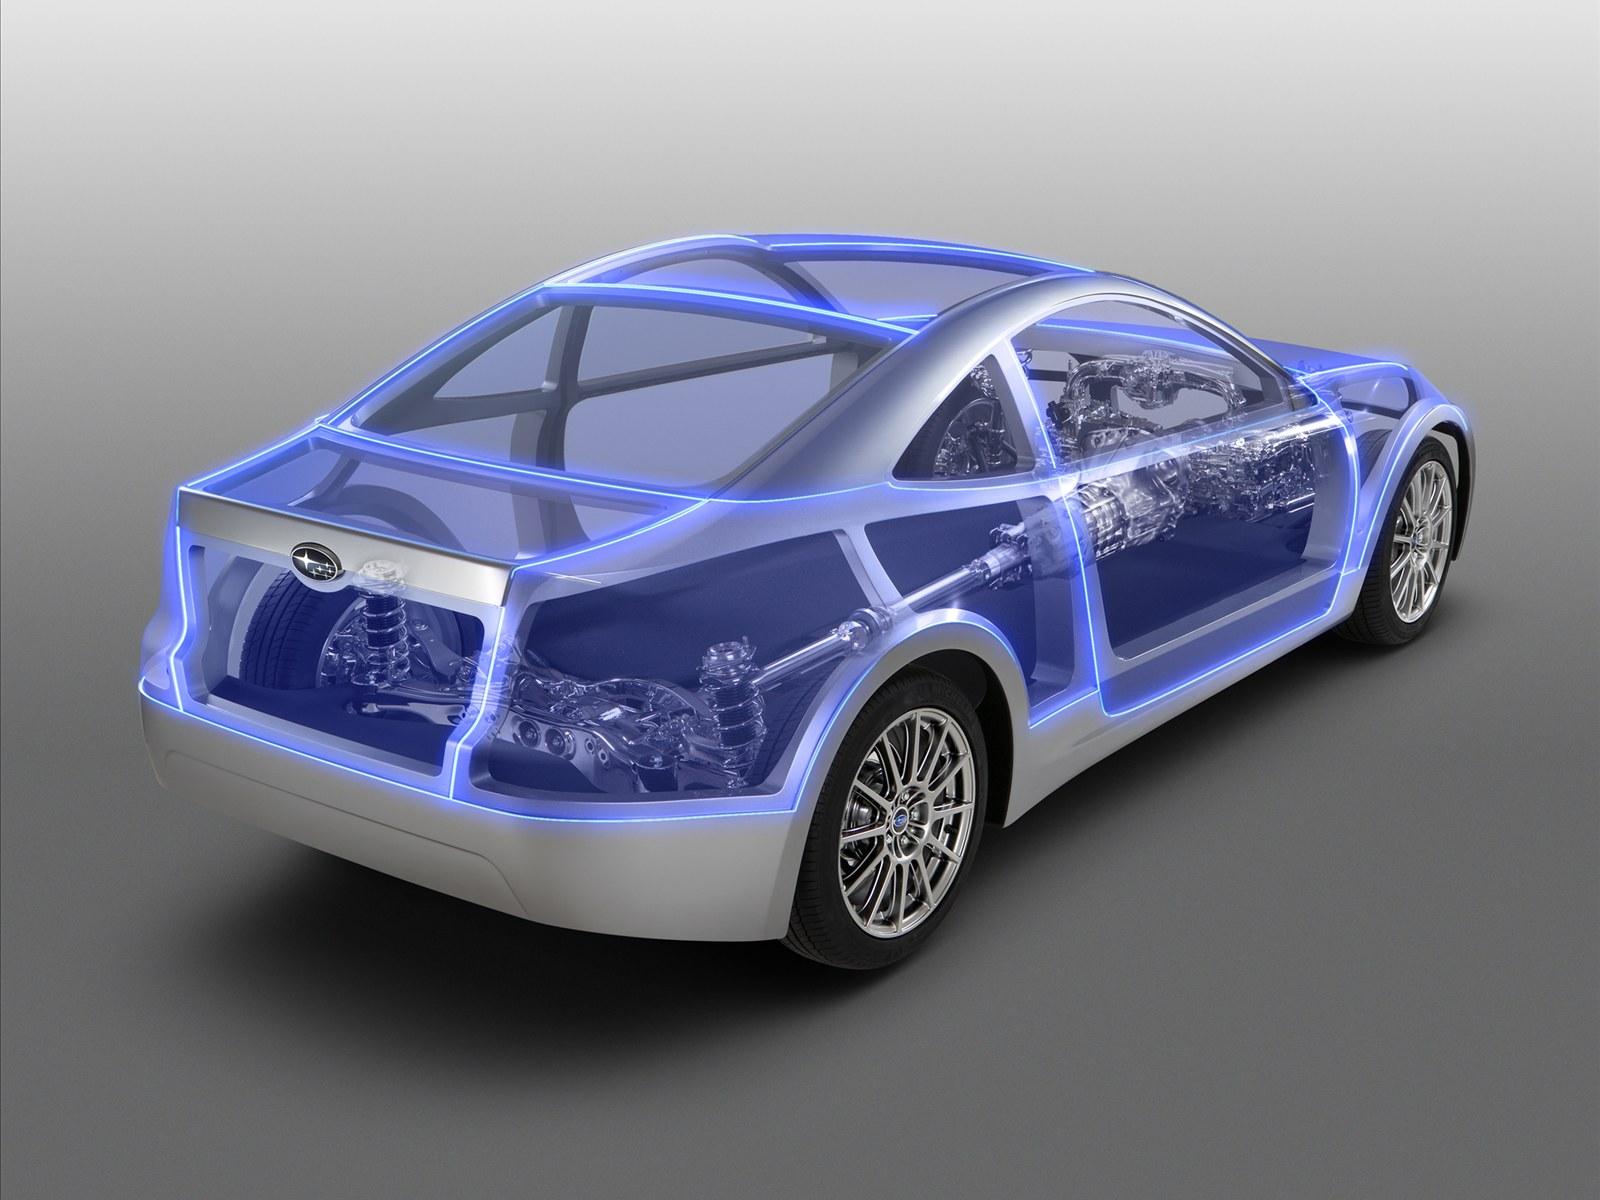 Car Pictures: Subaru Boxer Sports Car Architecture 2011